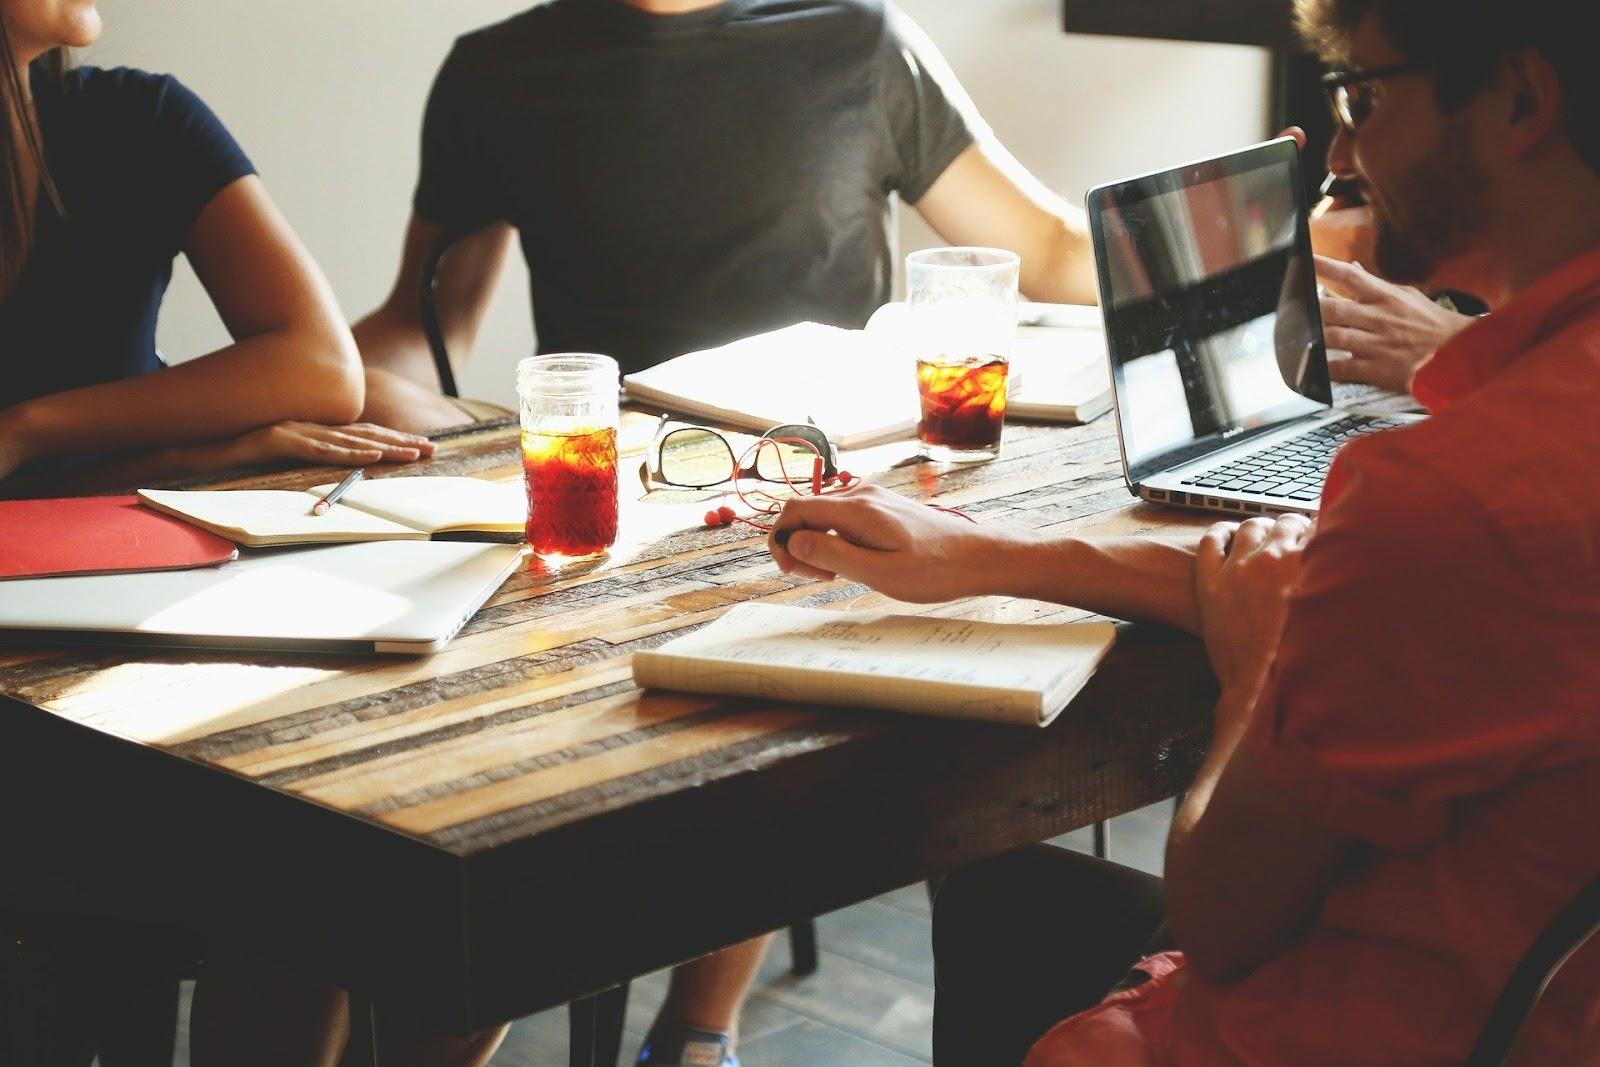 startup-meeting-brainstorming-594091/effective elearning